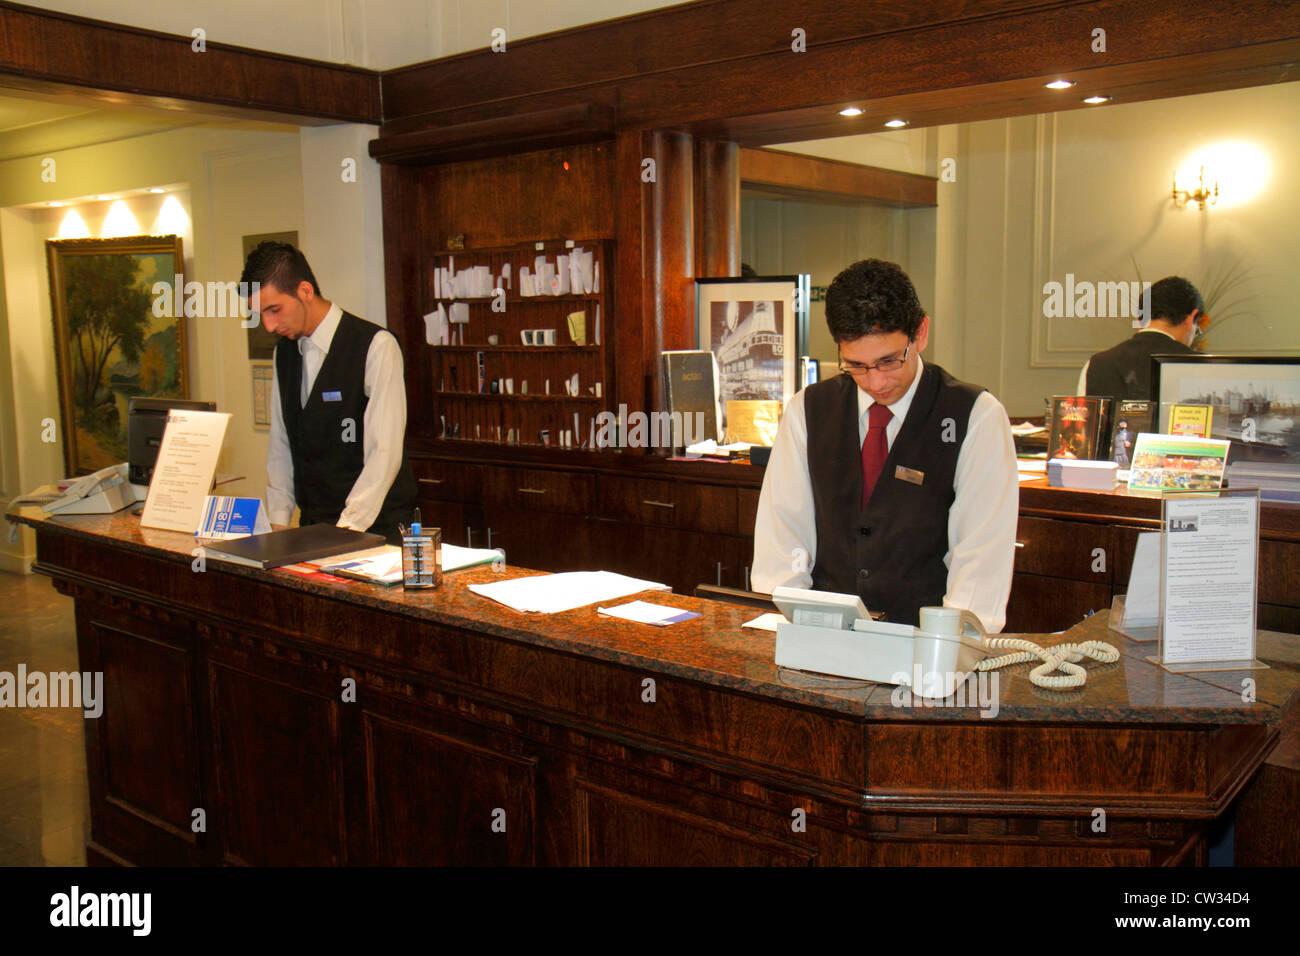 Marvelous Buenos Aires Argentina Avenida De Mayo Hotel Mundial Hospitality Lodging  Business Front Desk Hispanic Man Clerk Uniform Job Gues Gallery